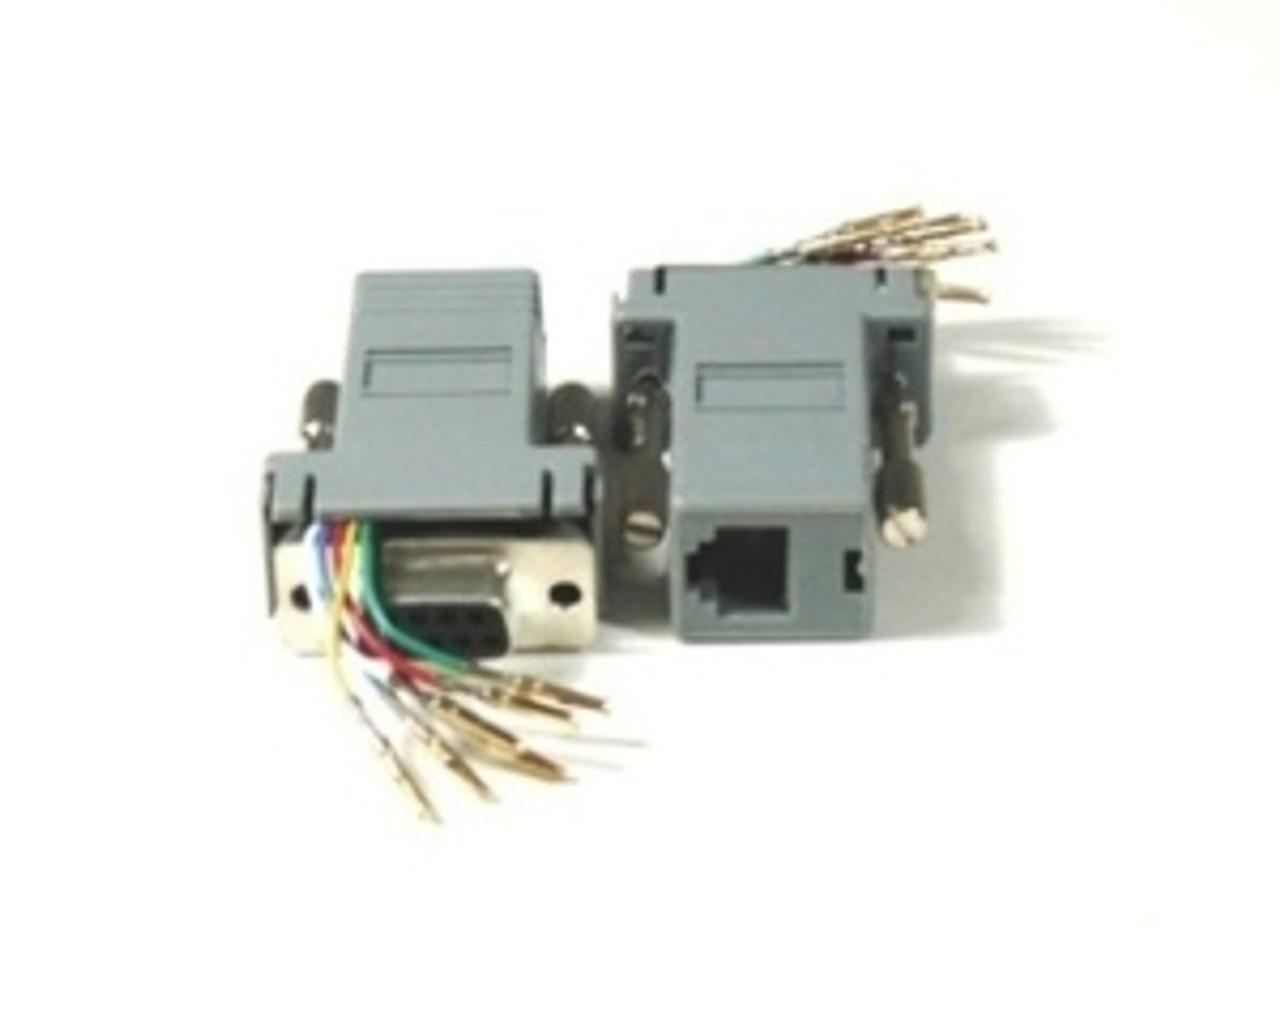 Modular Adapter DB9 Female to RJ11